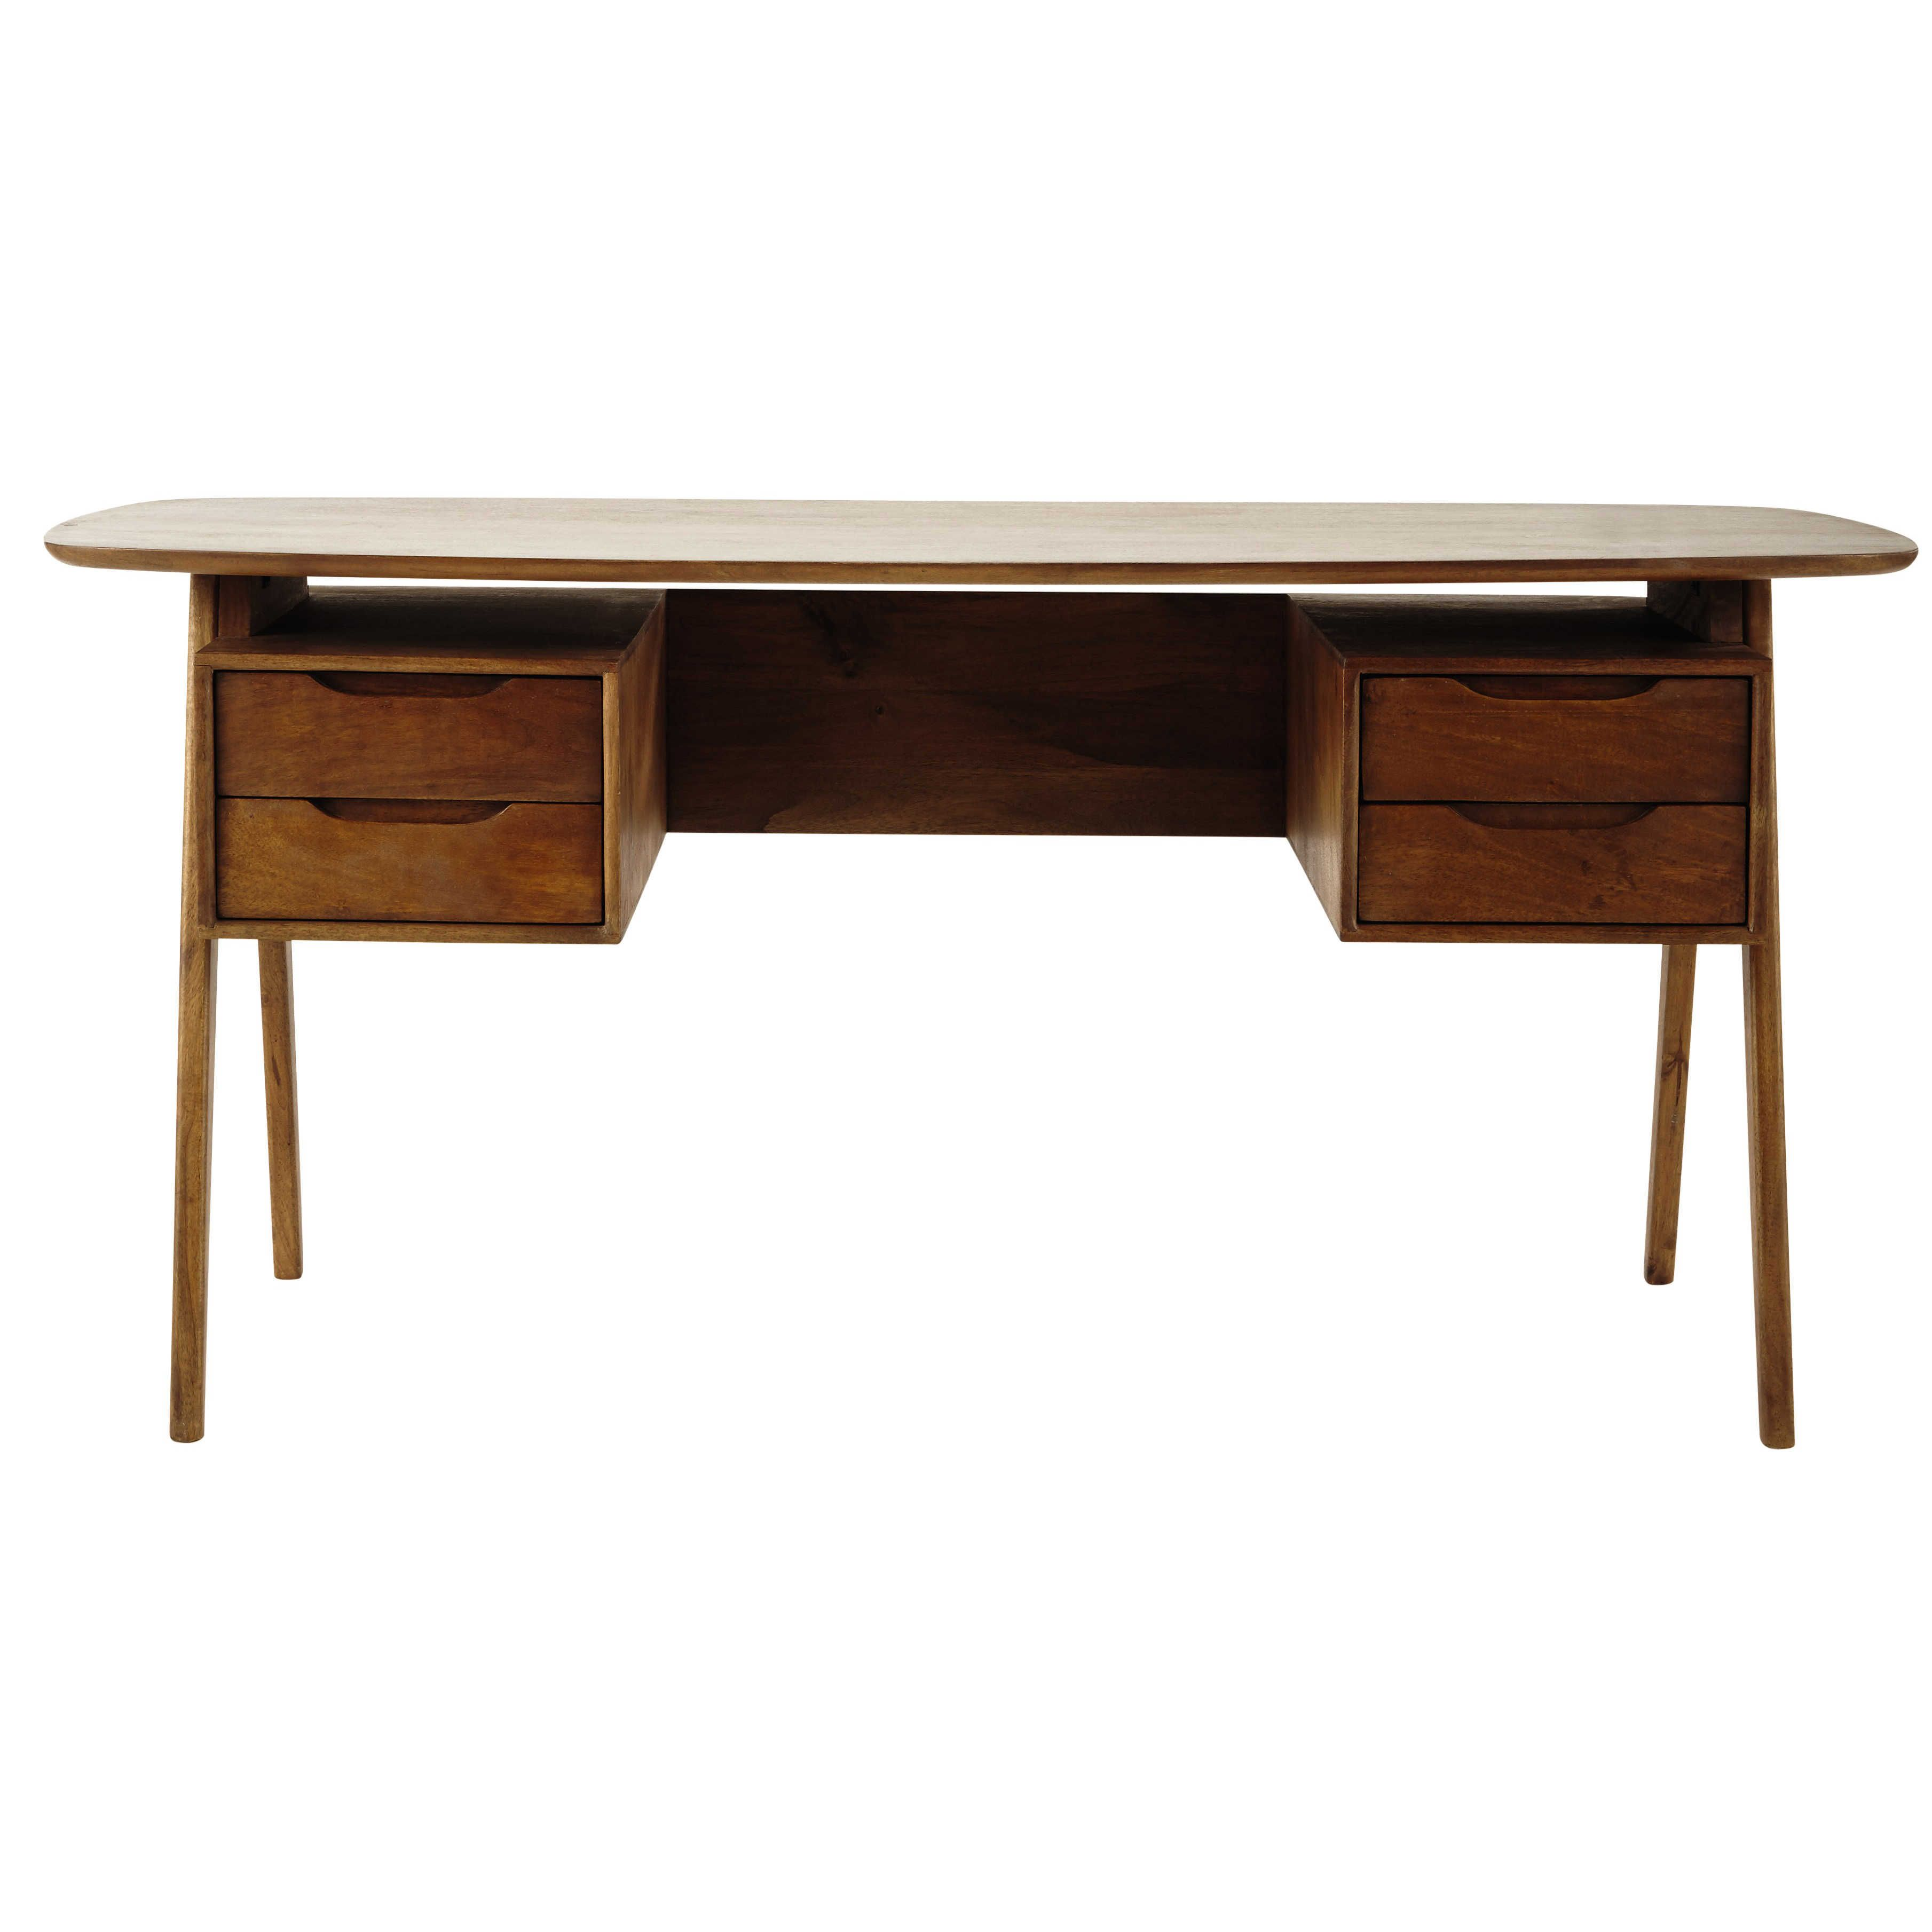 free escritorio vintage de madera de mango an cm janeiro maisons du monde with maison du monde range cd